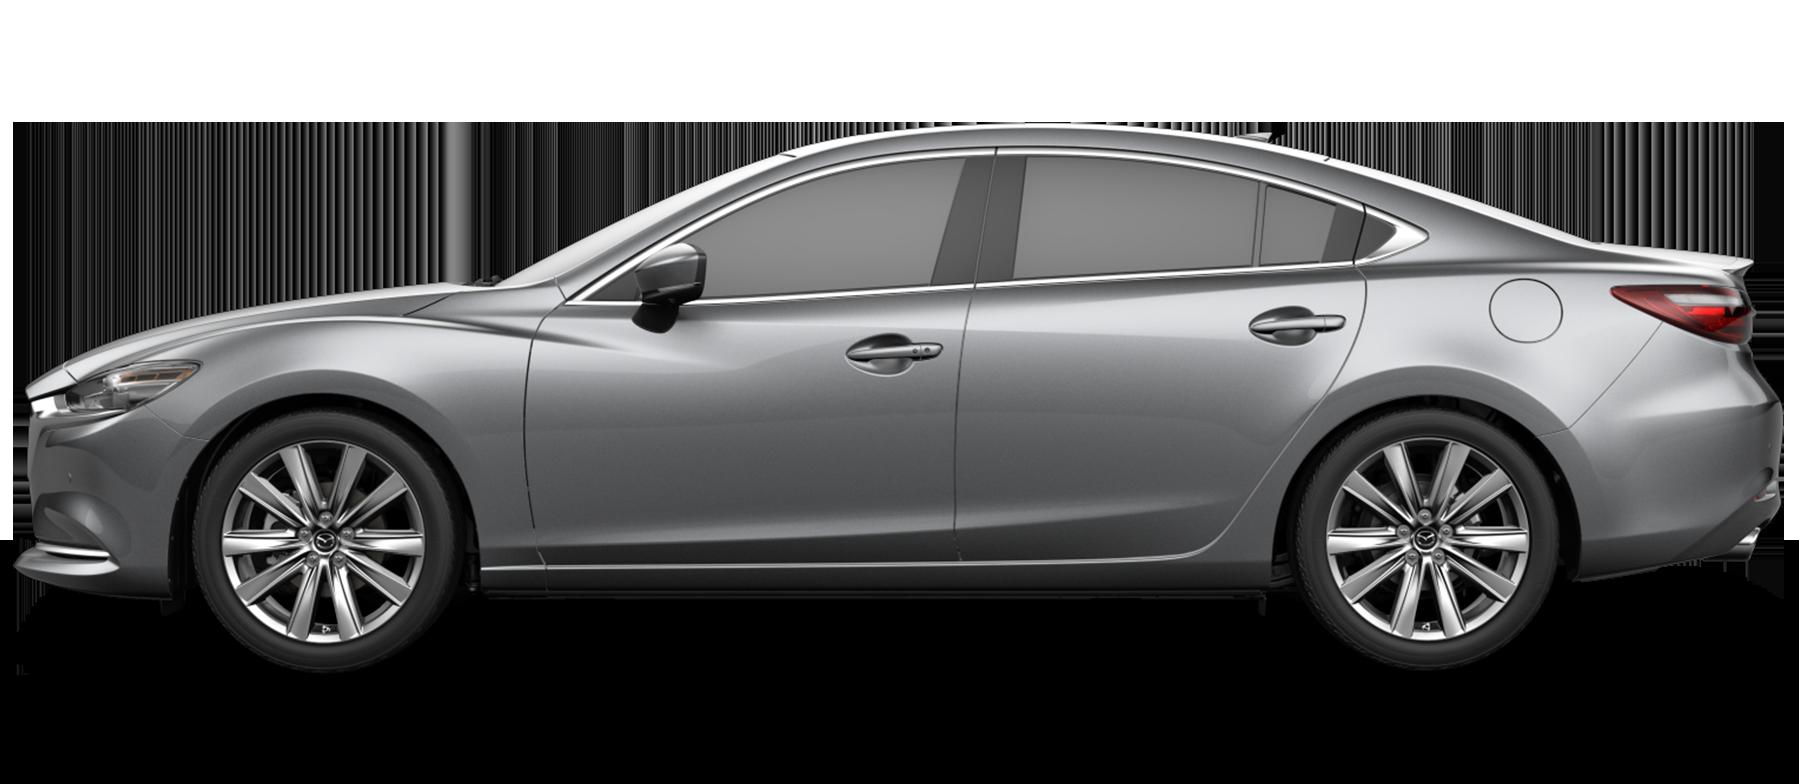 2007 mazda 6 owners manual free enthusiast wiring diagrams u2022 rh rasalibre co 2012 Mazda 3 2015 Mazda CX-5